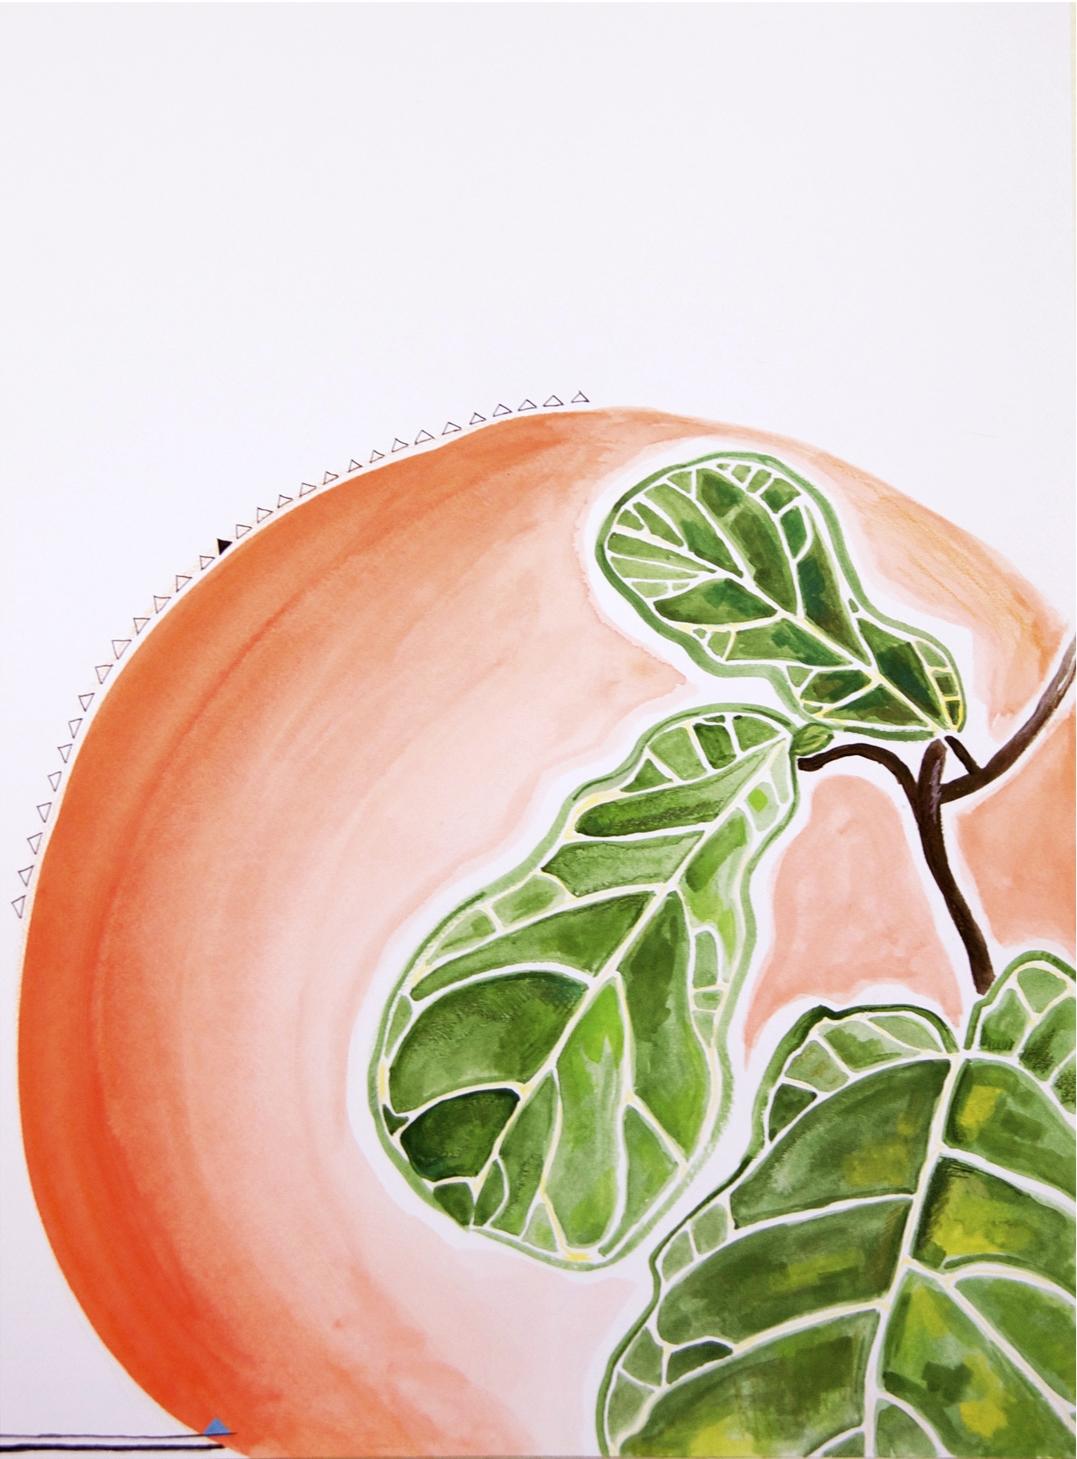 figgie & the giant peach \\ 18x24 mixed media on paper #mysortofgreenthumb >> S O L D <<